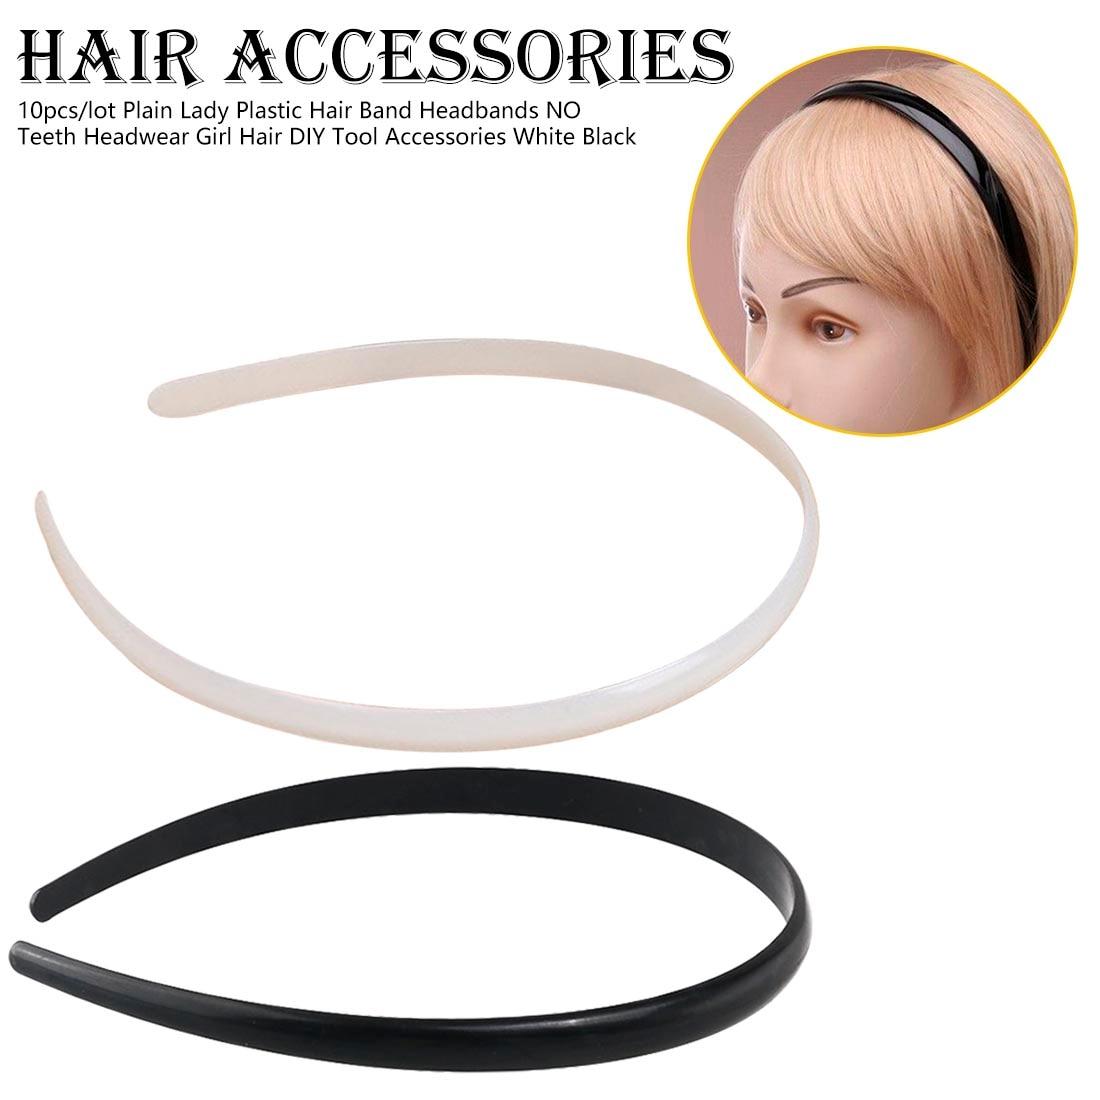 10pcs/lot Plain Lady Plastic Hair Band Headbands NO Teeth Headwear Girl Hair DIY Tool Accessories White Black